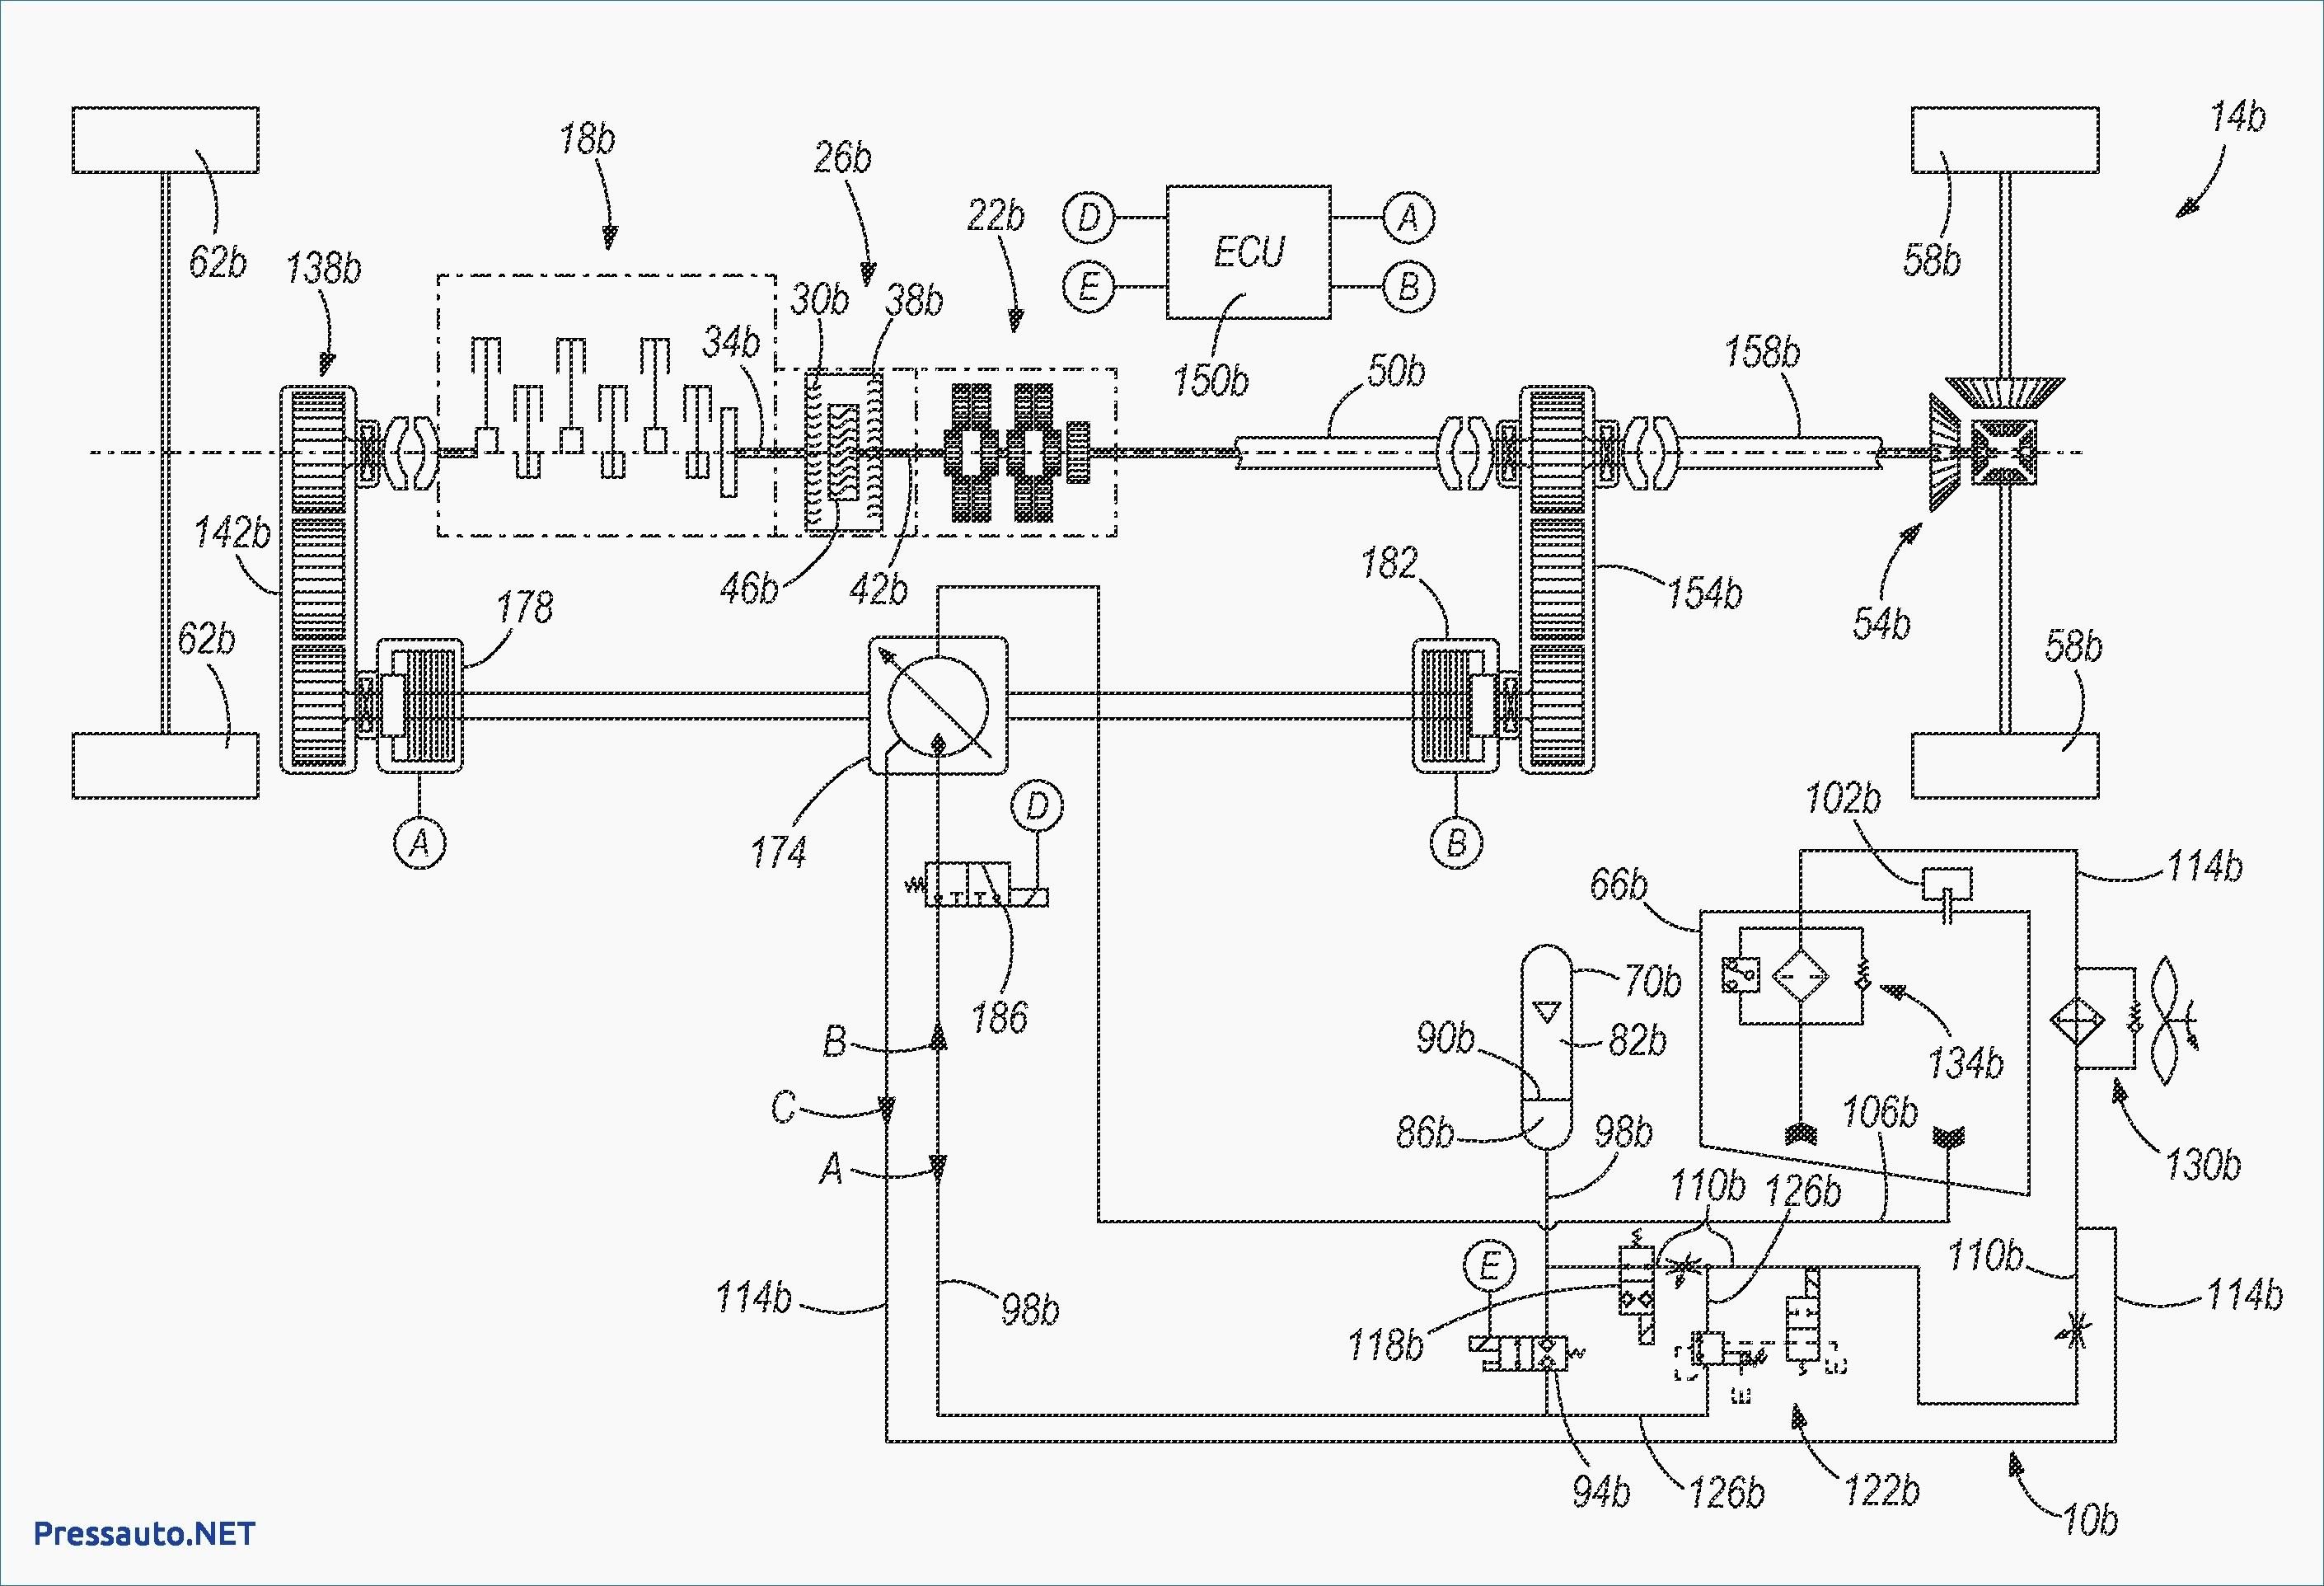 hight resolution of wiring diagram mahindra 7010 wiring diagram centre wiring diagram mahindra 475 wiring diagrammahindra 2216 wiring diagram